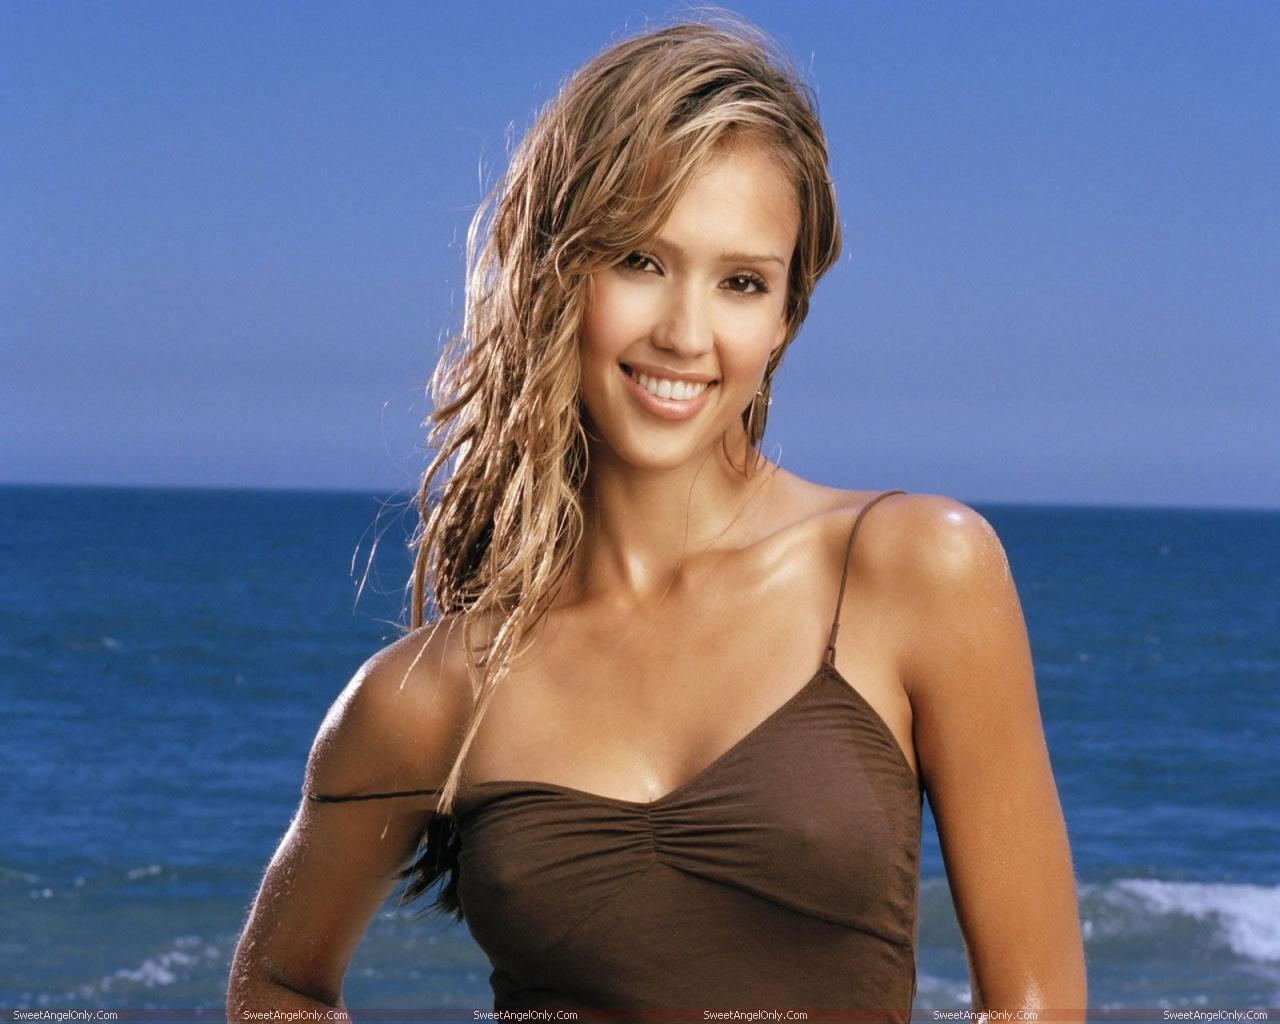 http://1.bp.blogspot.com/-1P9CIdvkW6Y/TXFBDObBreI/AAAAAAAAE6M/VF0xLm_qWKw/s1600/jessica_alba_hollywood_hot_actress_wallpaper_03.jpg